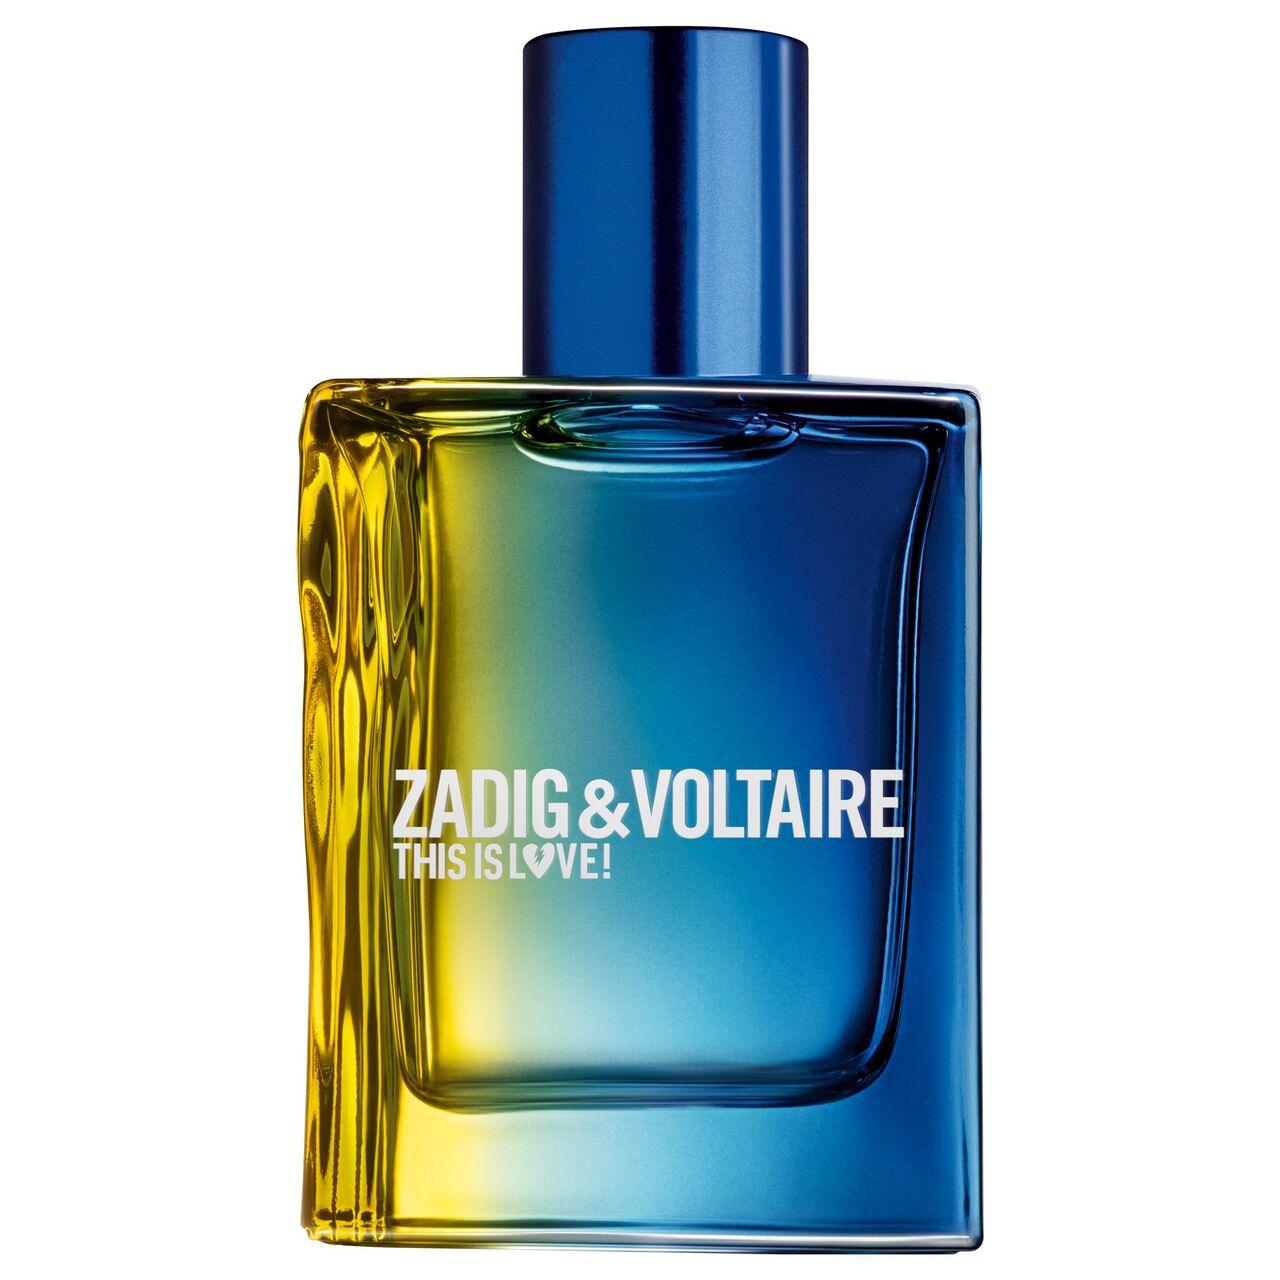 Zadig & Voltaire This is Love! Pour Lui EDT 30ML